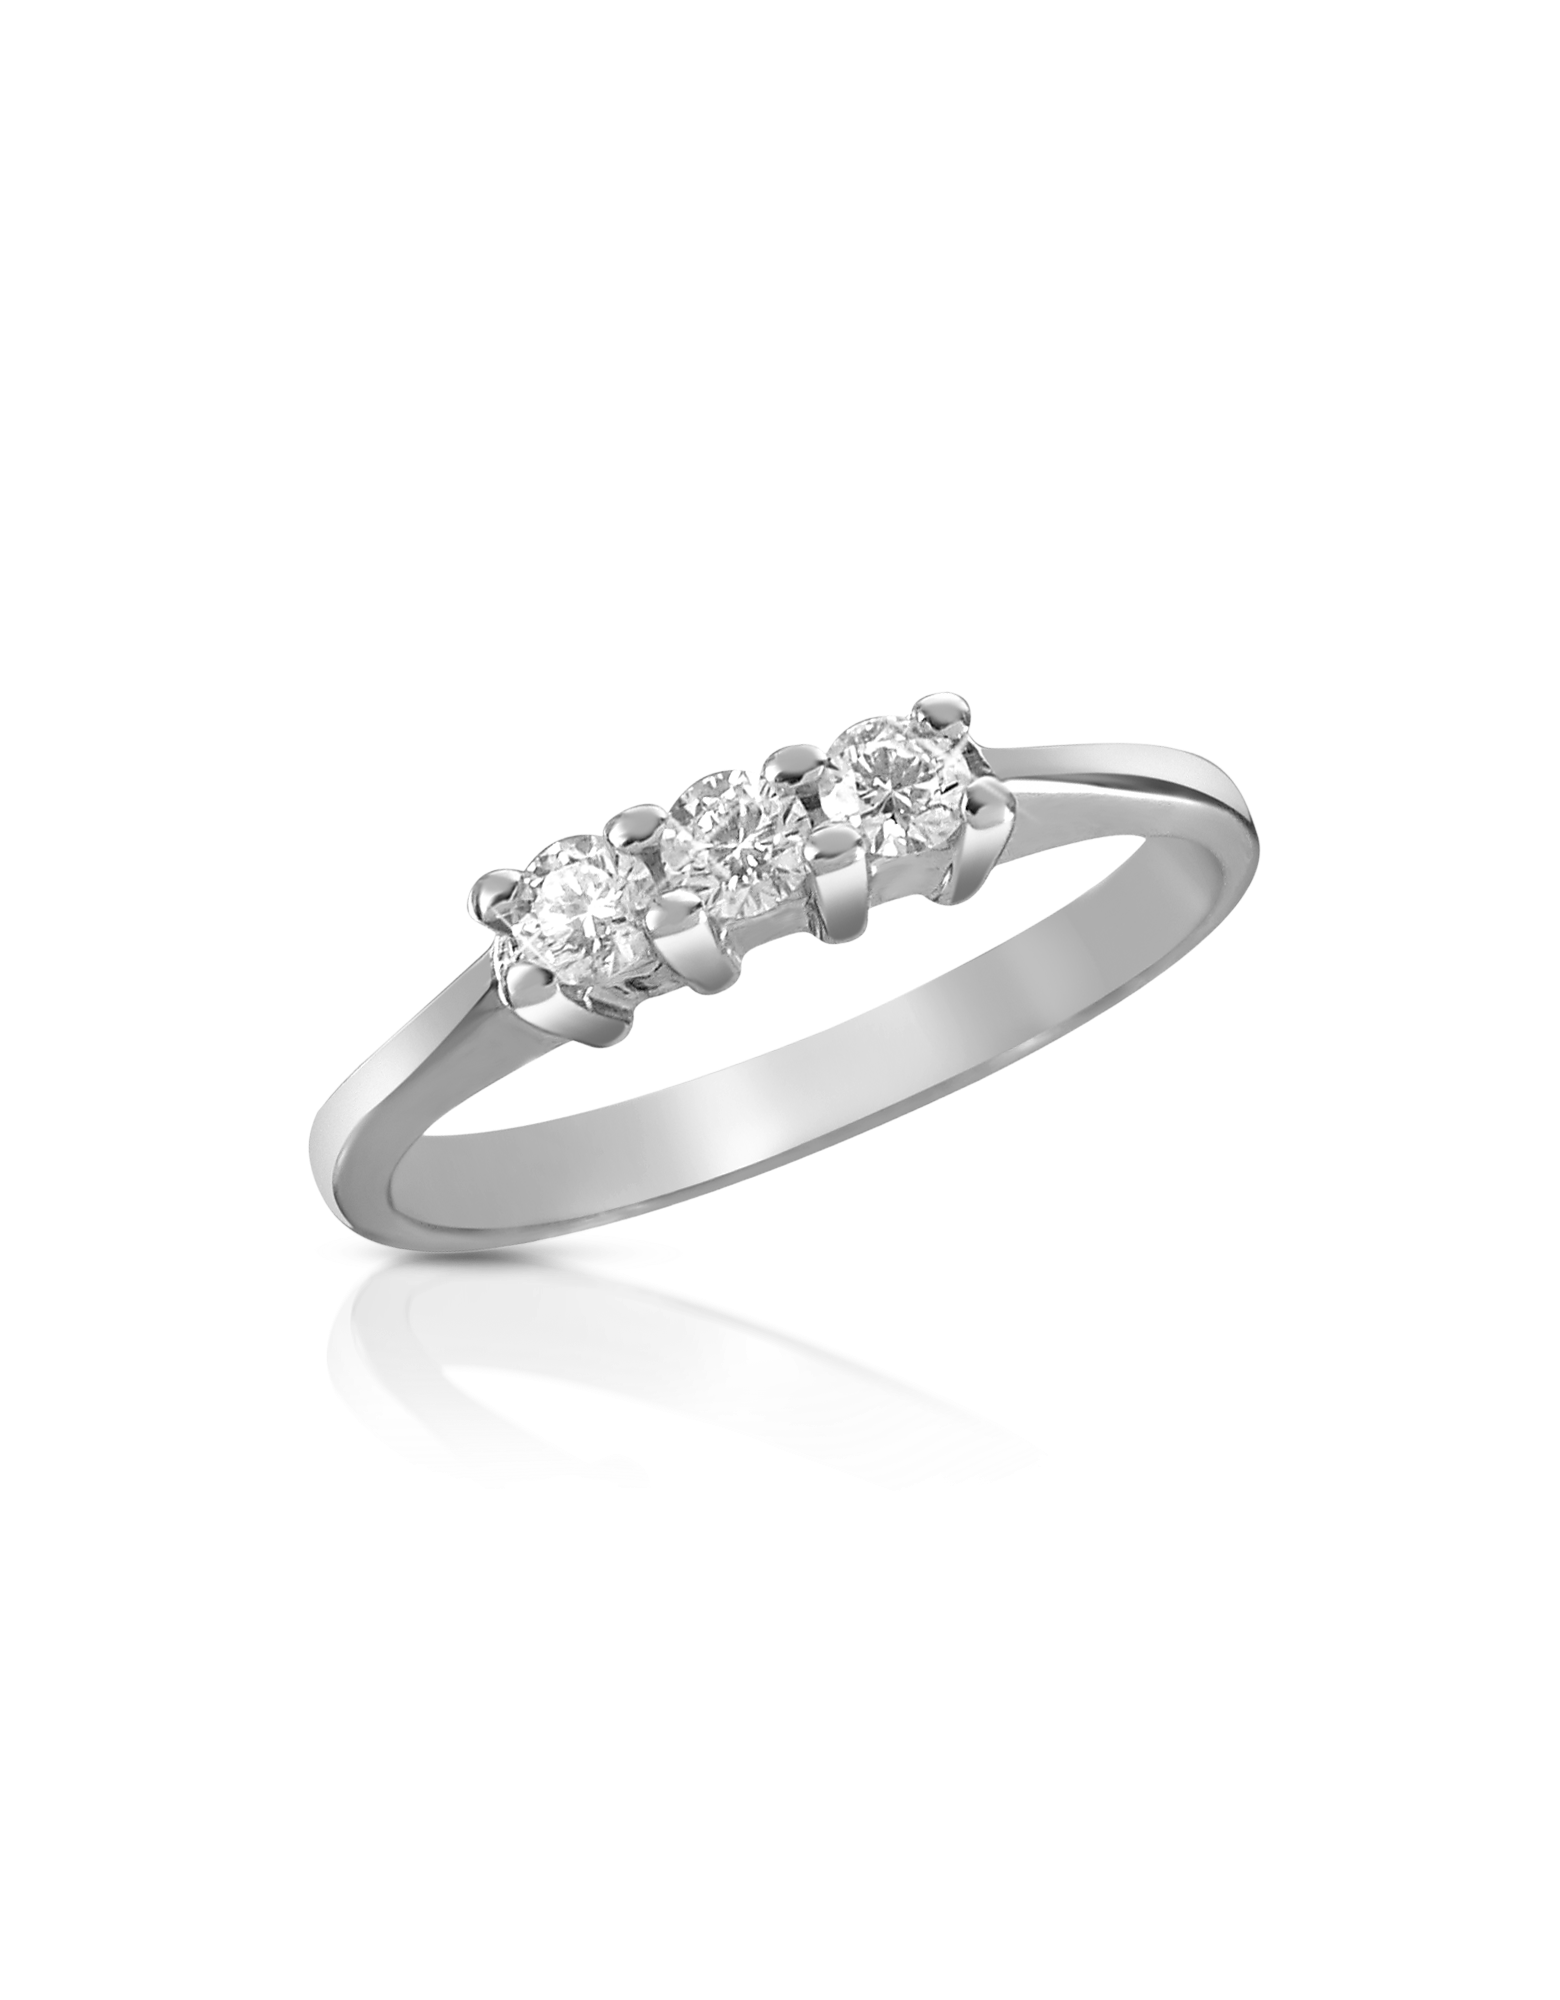 Image of 0.10 ct Three-Stone Diamond 18K Gold Ring